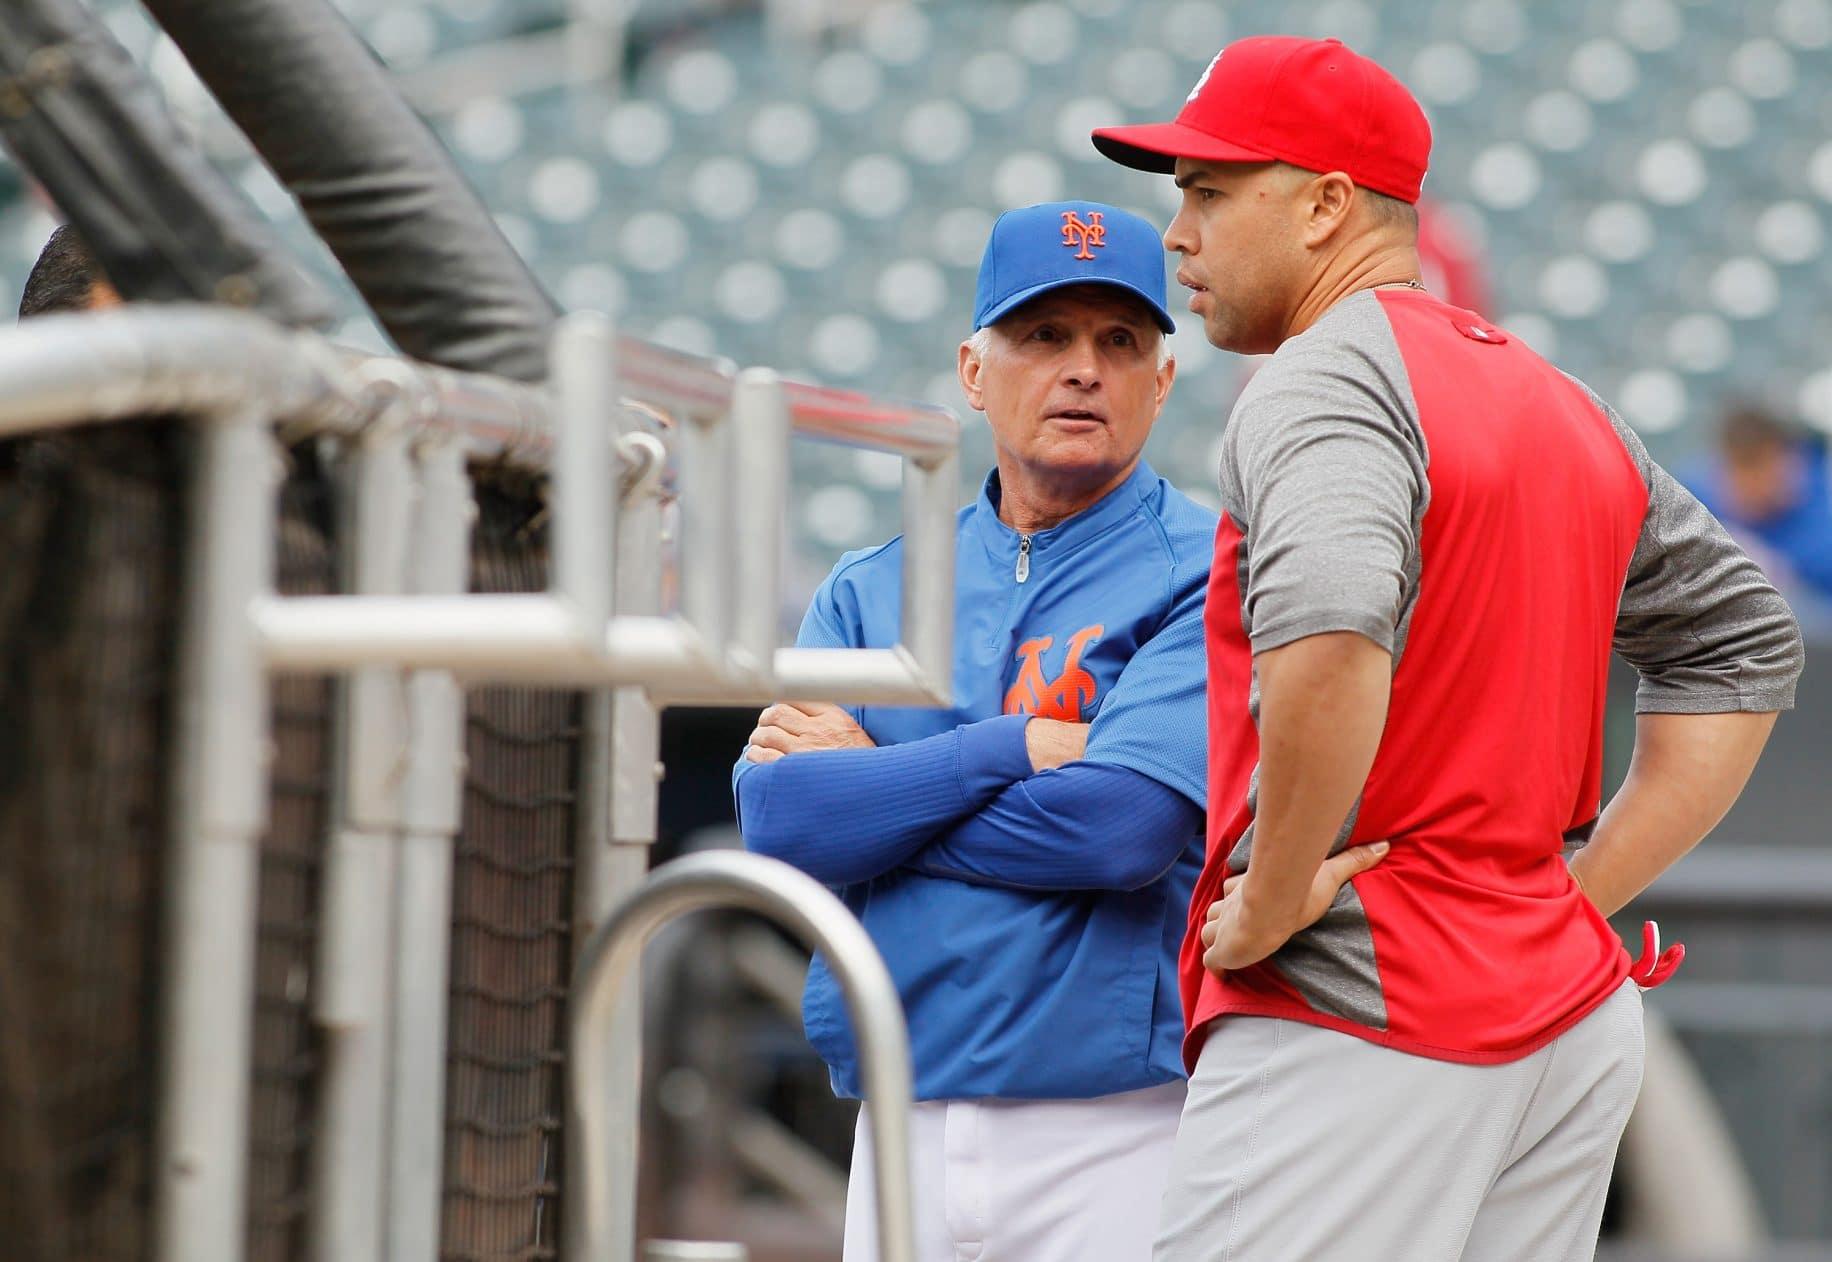 New York Mets Amazin News 12/7/17: Terry Collins, future bench coach?